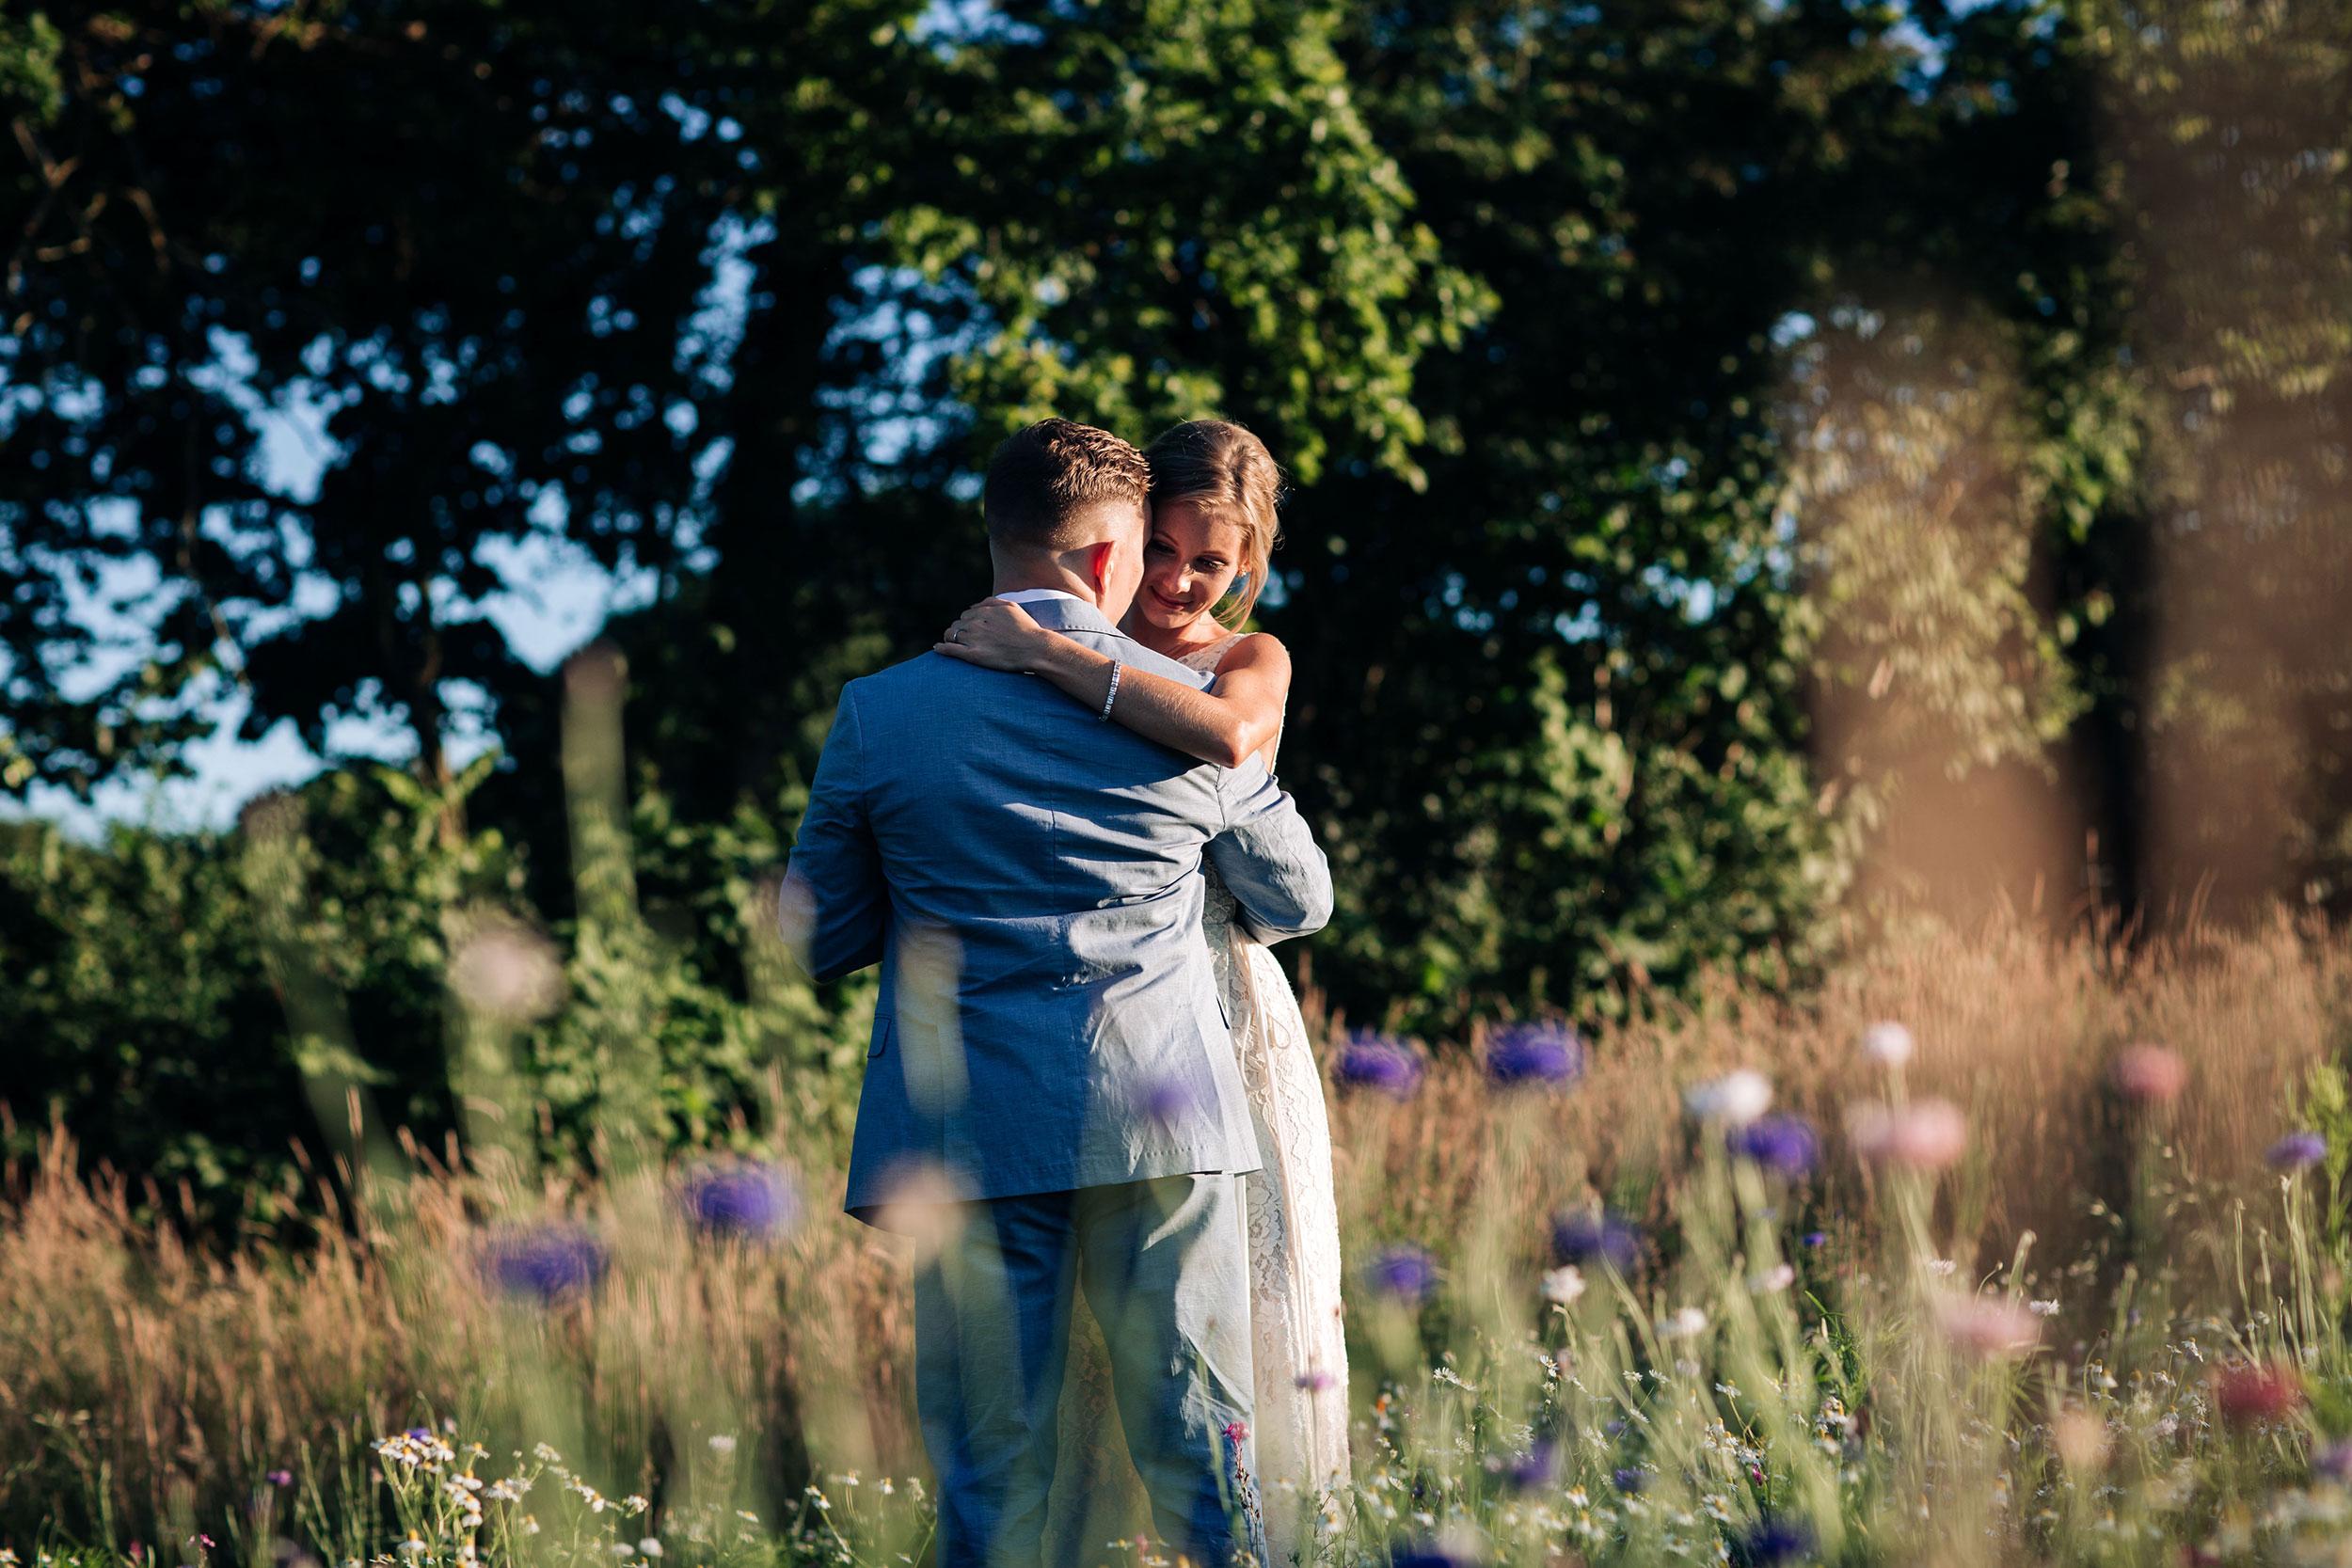 16.07.16-Tanya-&-Jethro-Wedding-Selection-76.jpg